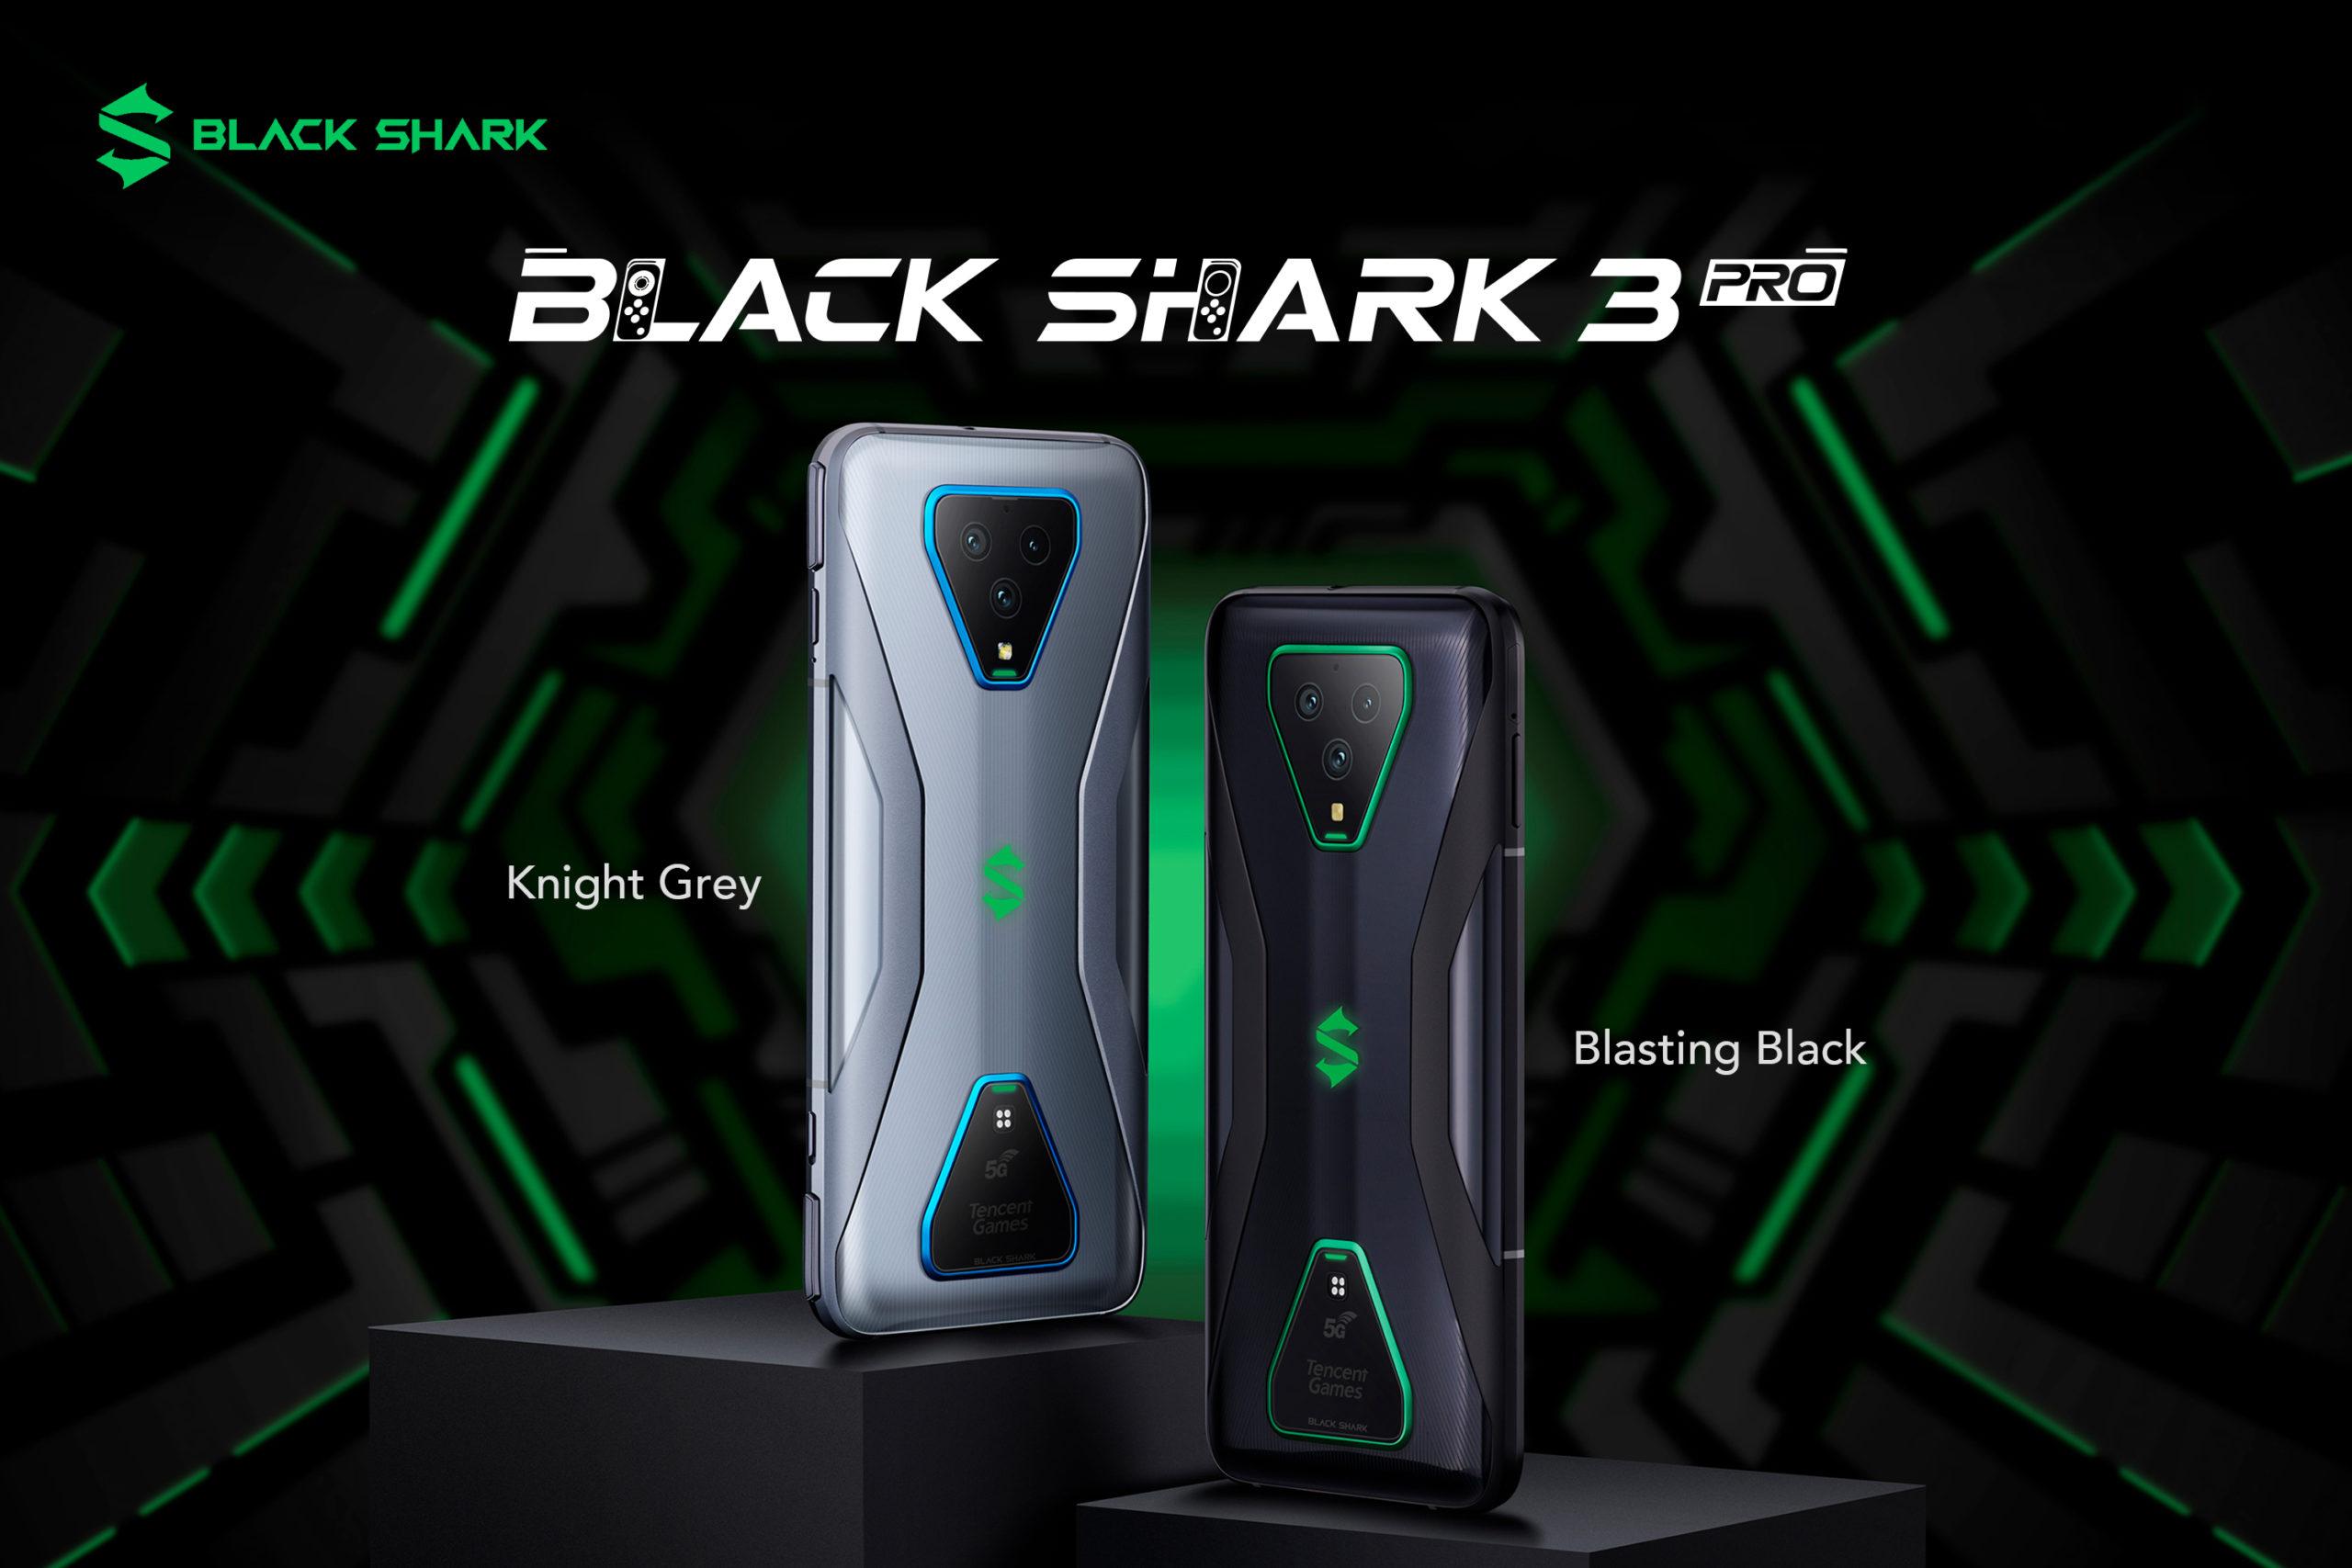 Black Shark Unveiled The World First 5g Gaming Smartphone Black Shark 3 Black Shark 3 Pro And Black Shark Bluetooth Earphones 2 Parliamo Di Videogiochi